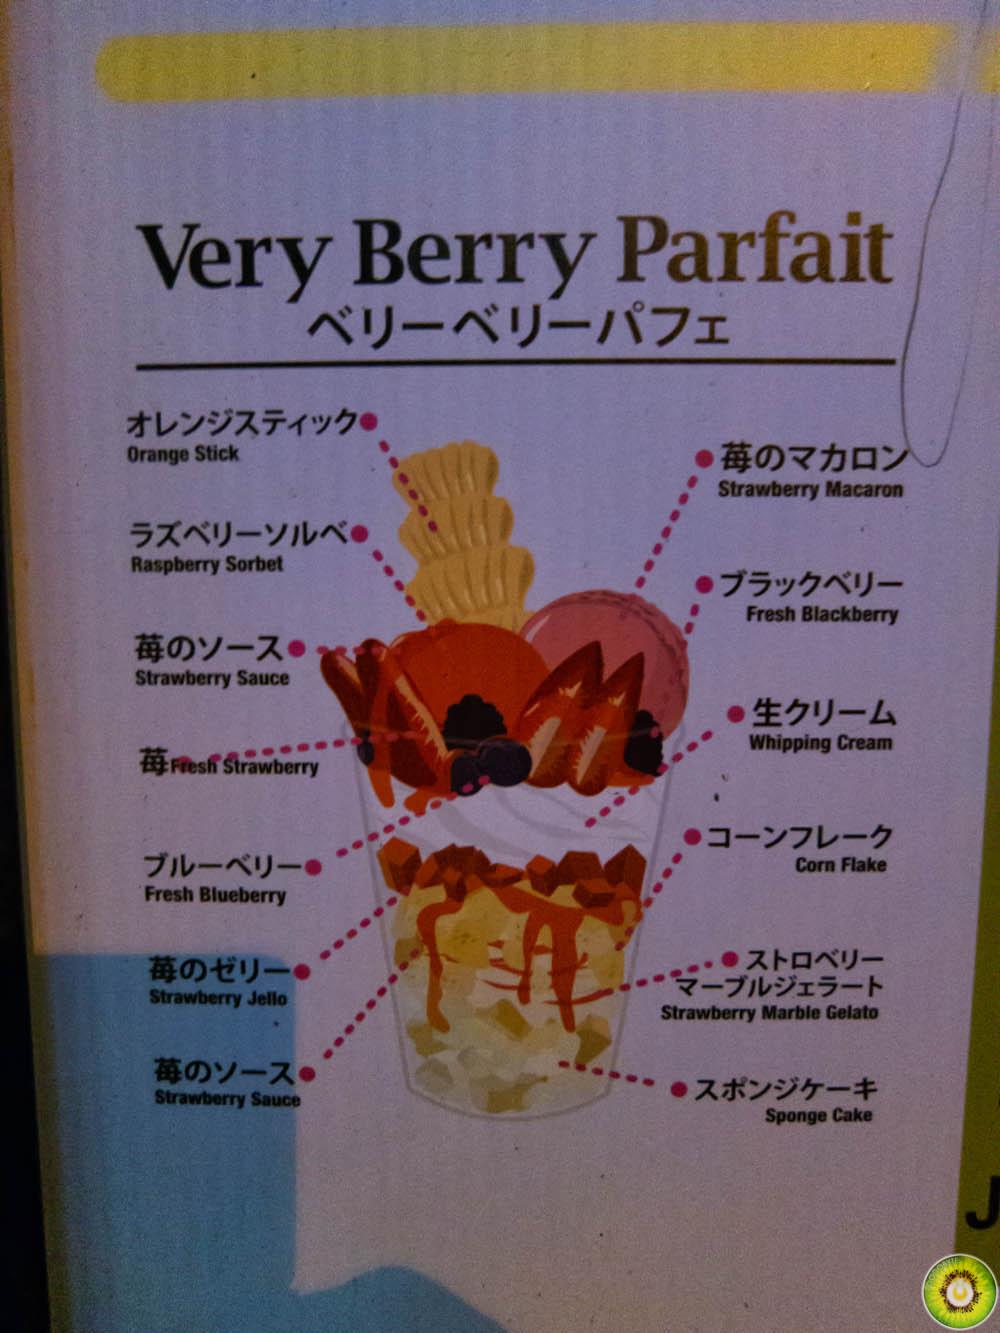 Very Berry Parfait Diagram